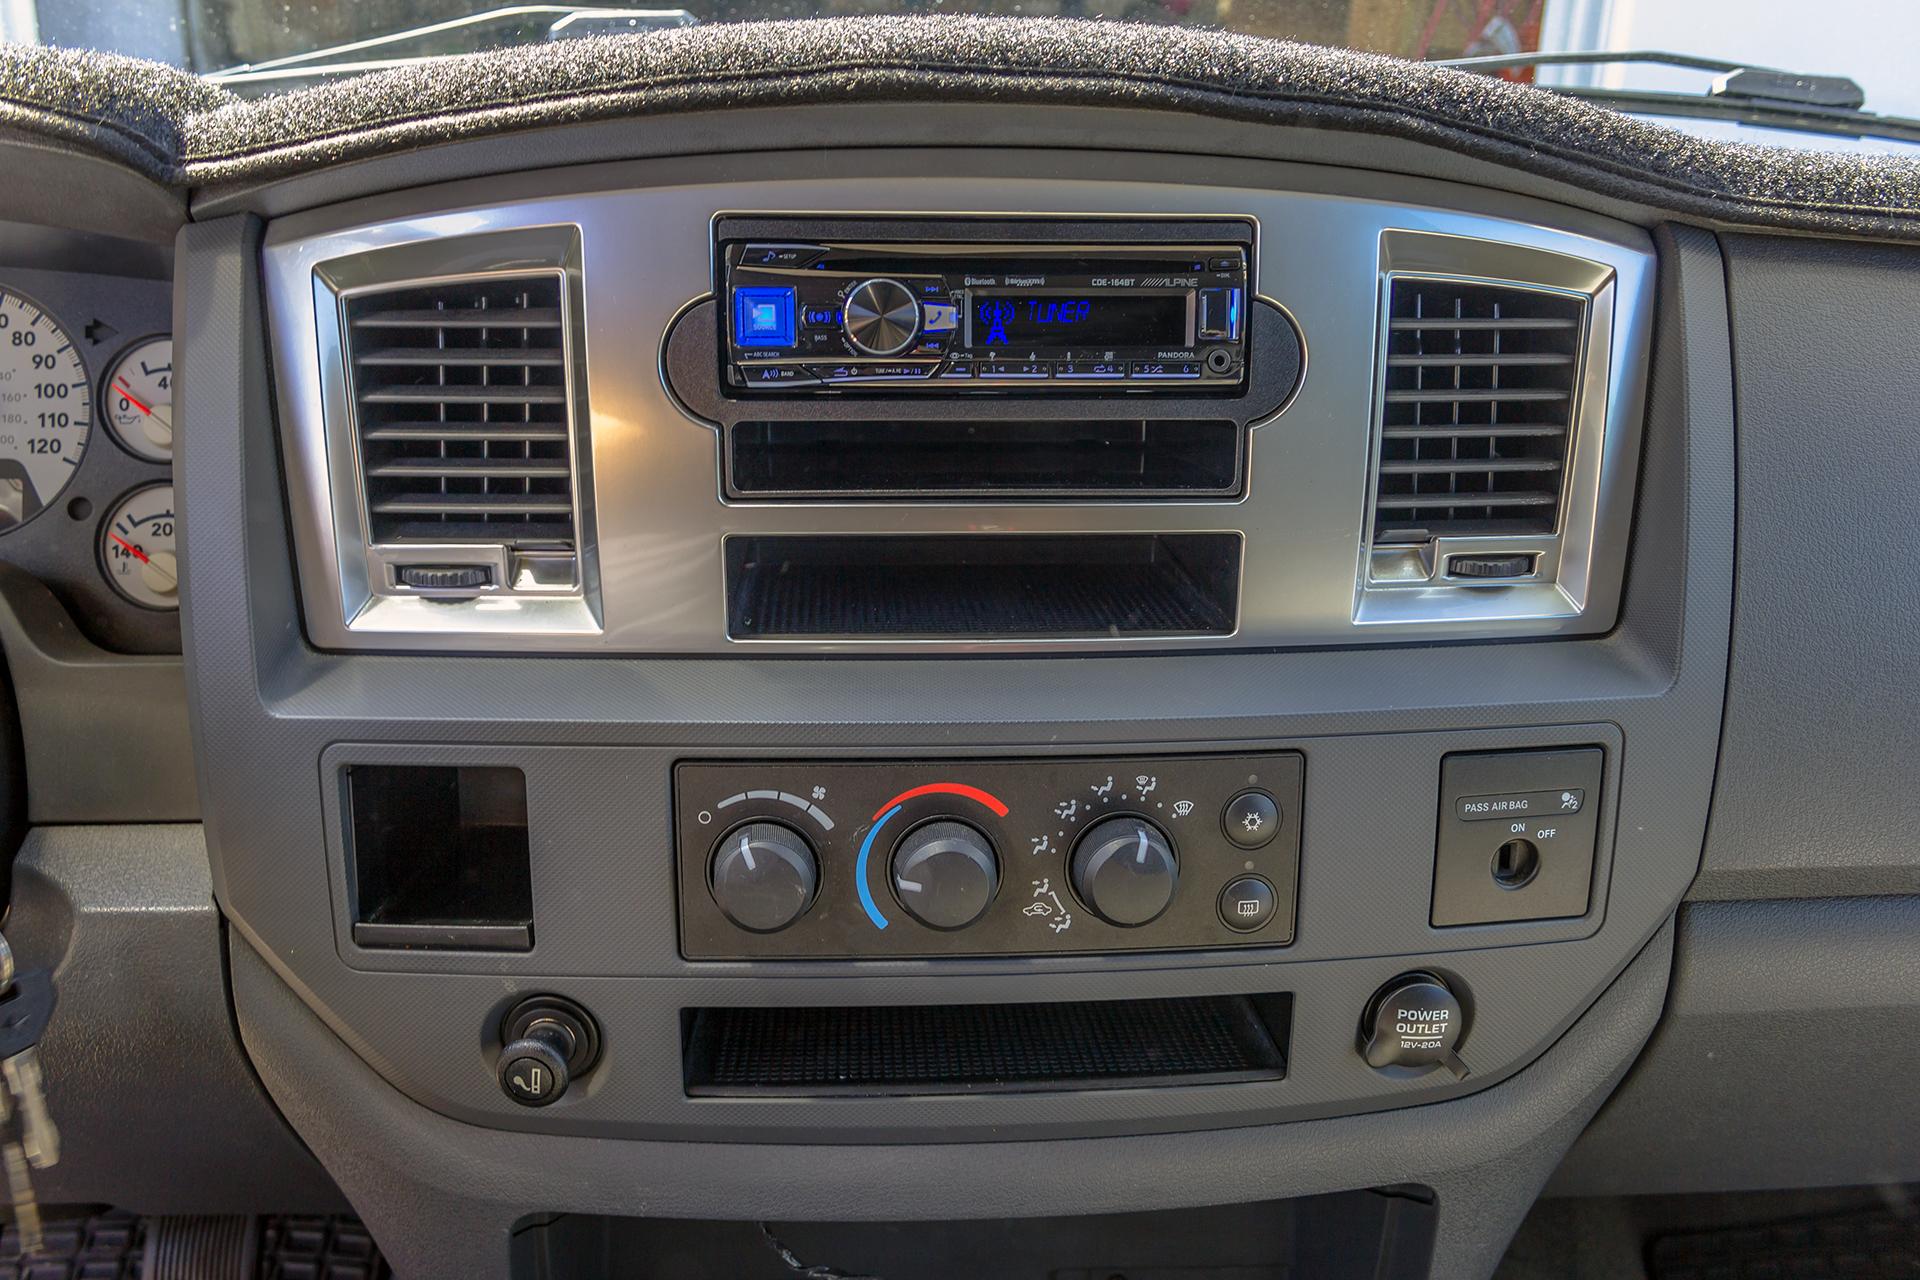 2007 Dodge Ram 2500 Radio Wiring Harness